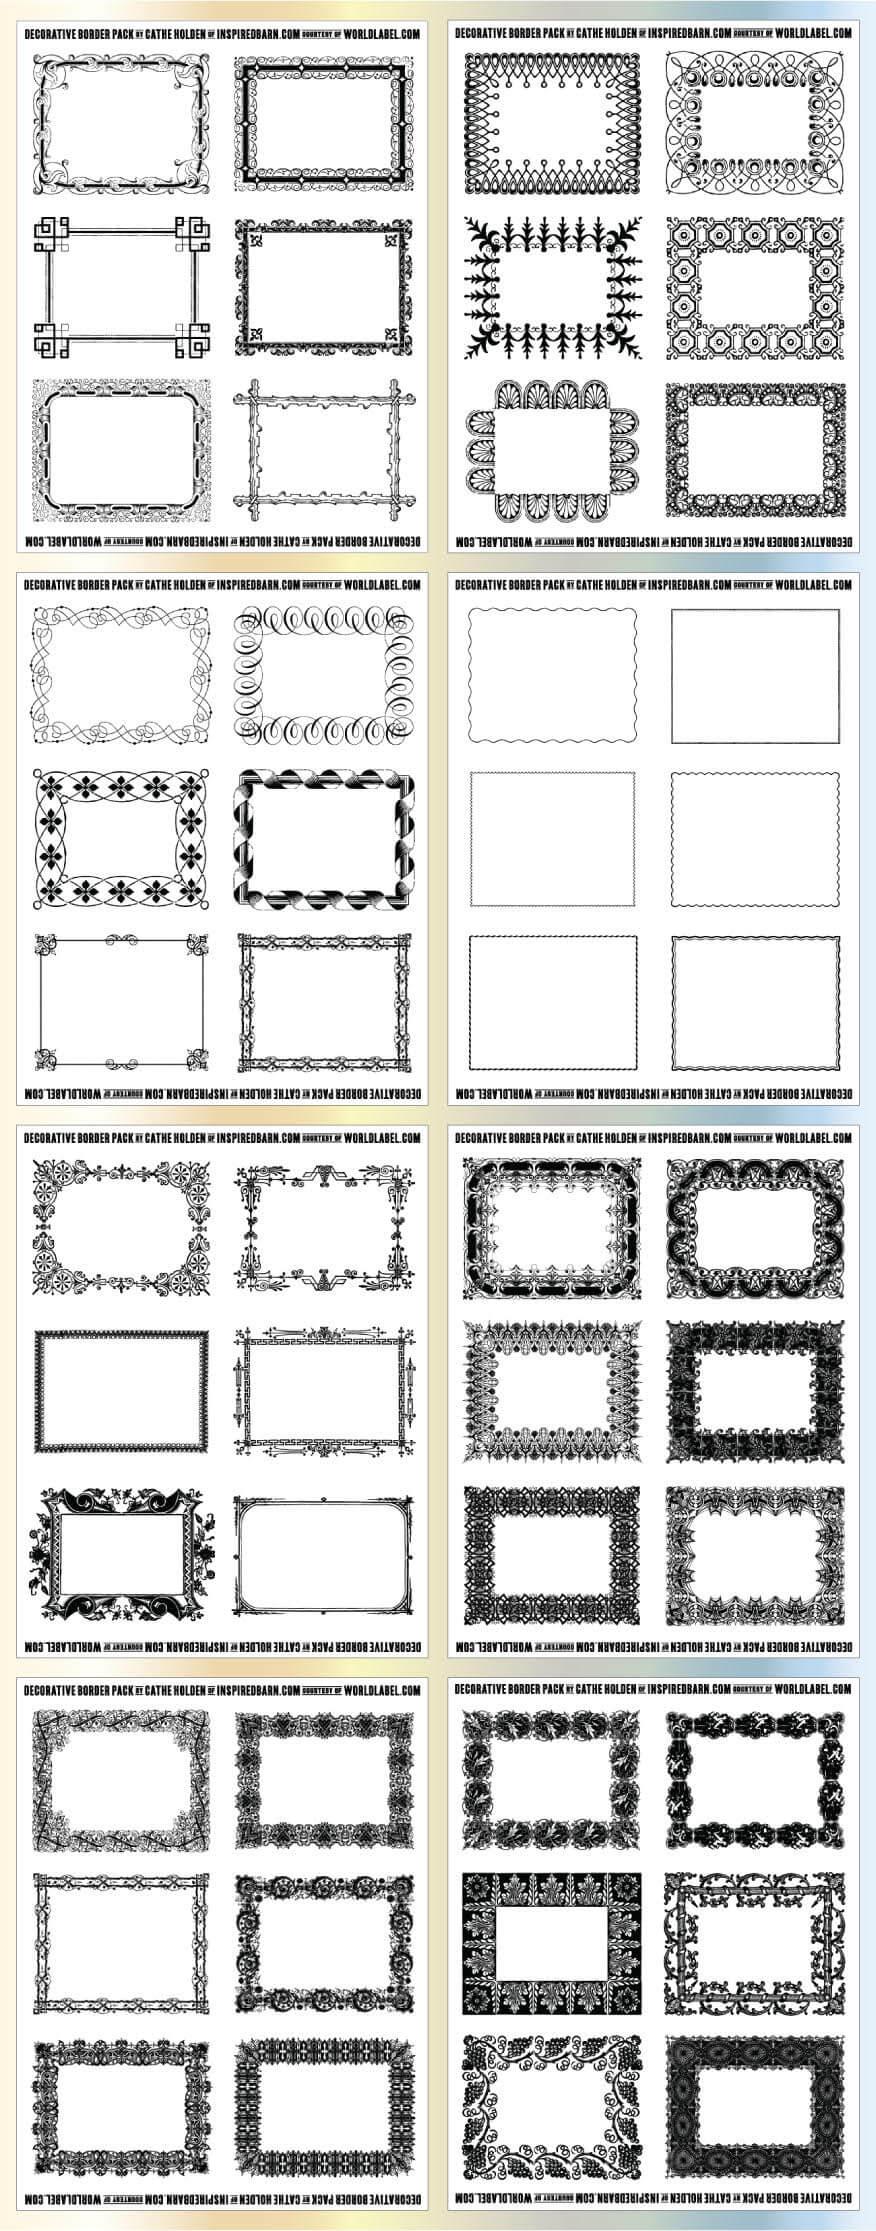 Free Printable Labels & Templates, Label Design @worldlabel intended for Word Label Template 8 Per Sheet